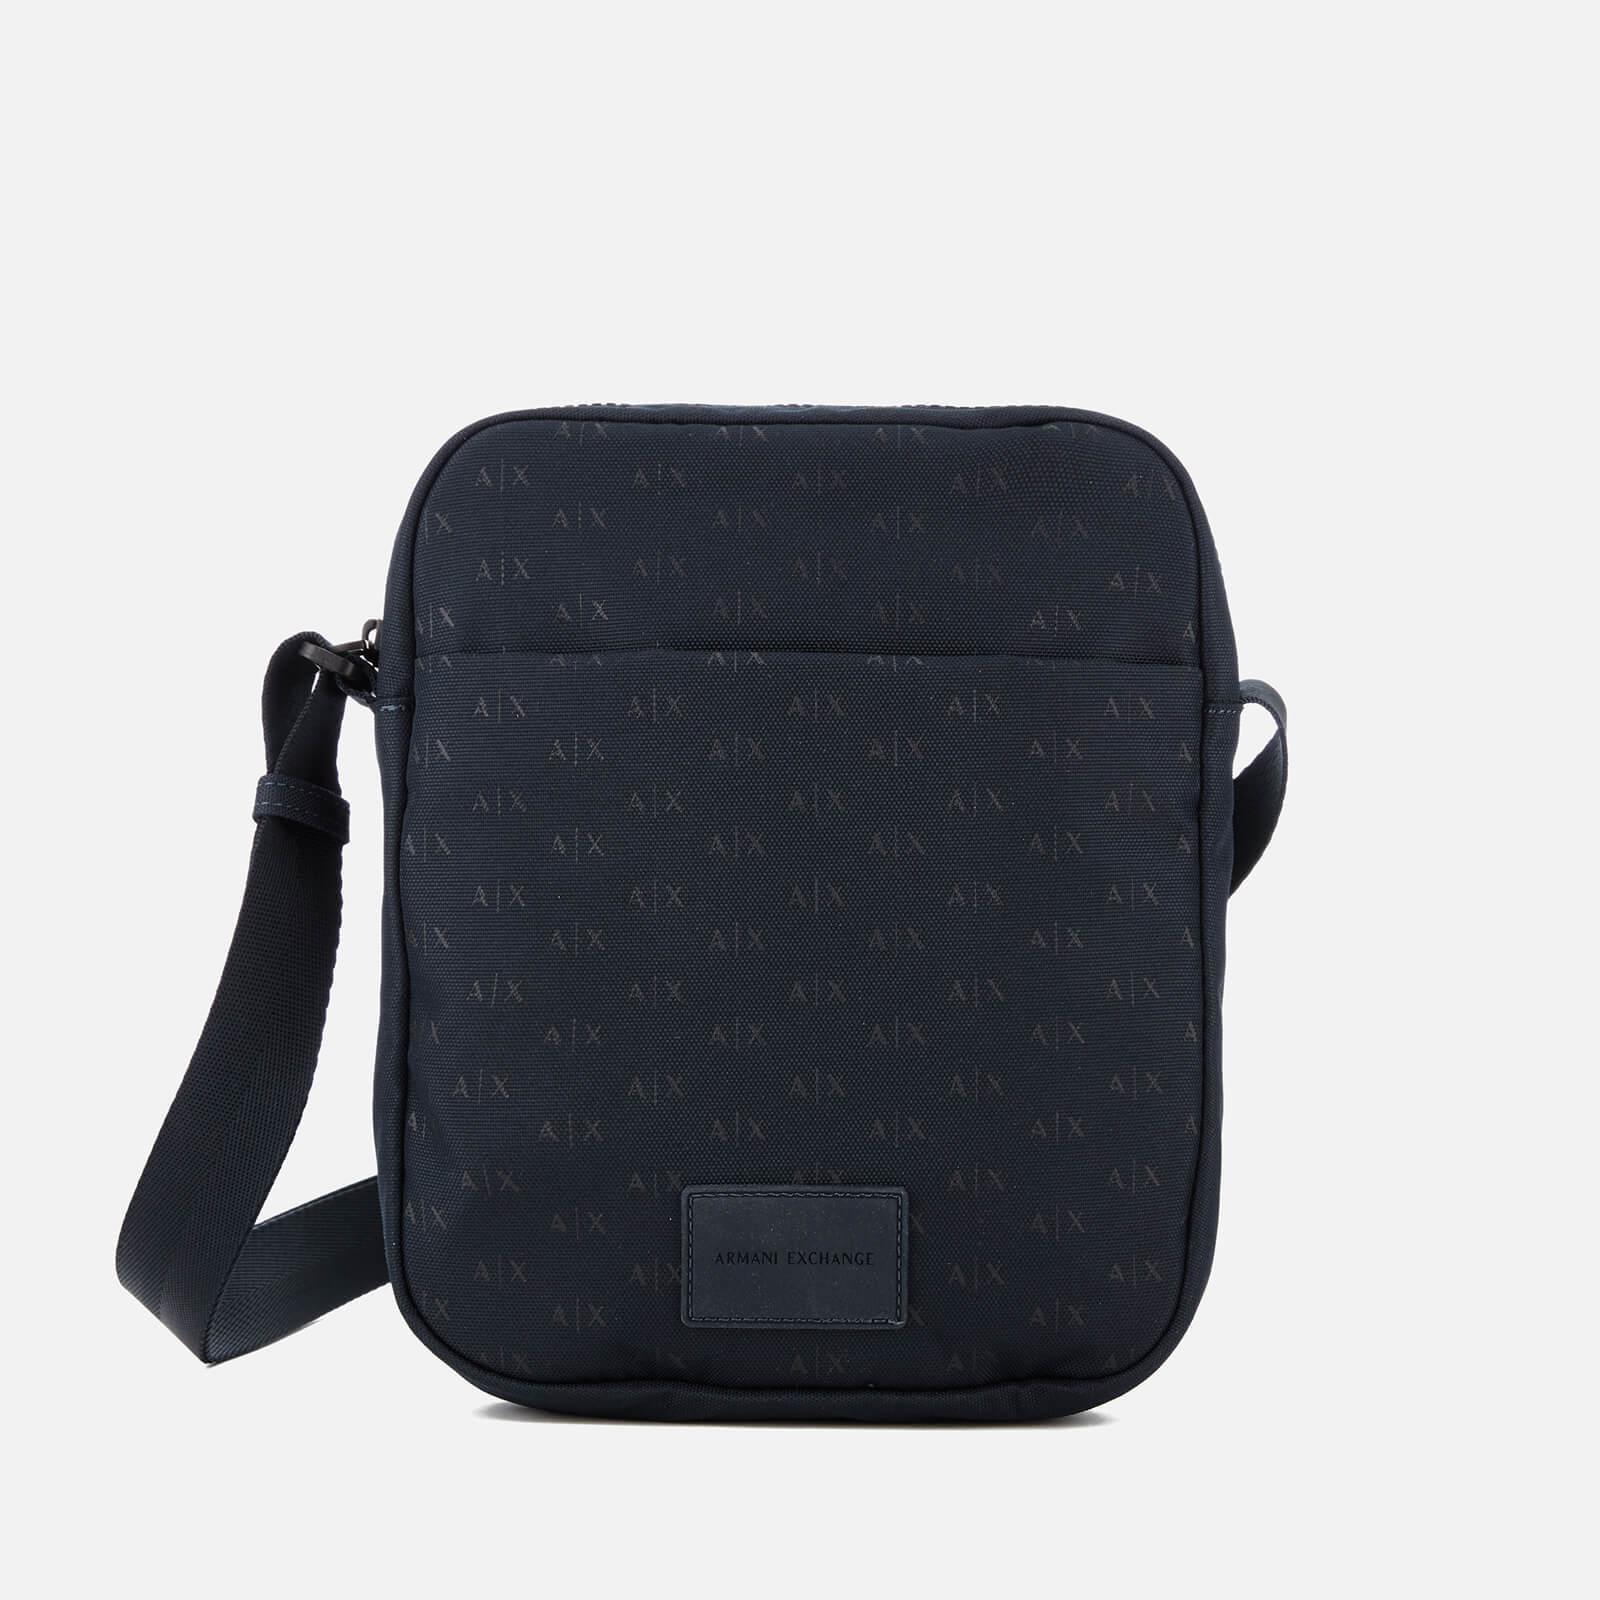 9446fd27e339 Lyst - Armani Exchange Ax All Over Logo Cross Body Bag in Blue for Men